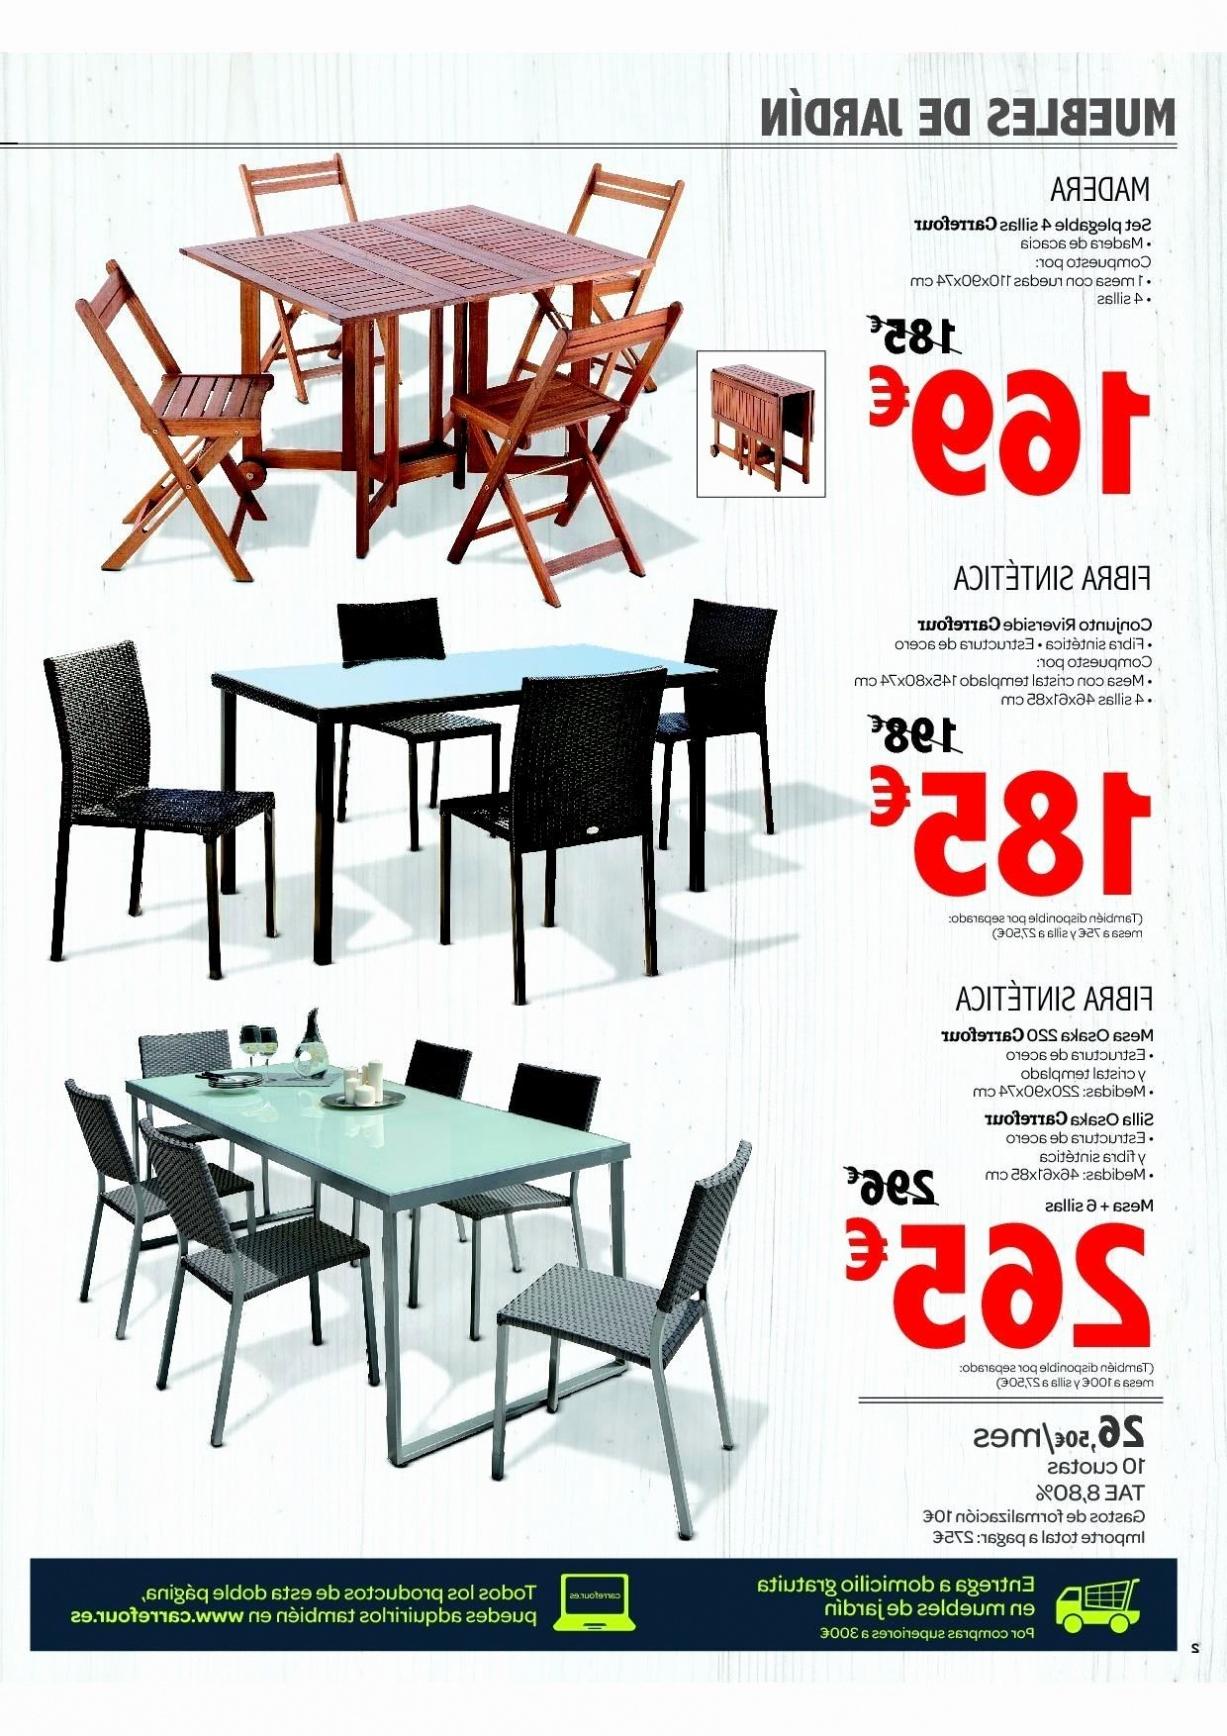 Mesas Carrefour T8dj Mesas Y Sillas De Jardin Carrefour Awesome Bancos Para Jardin à Nico